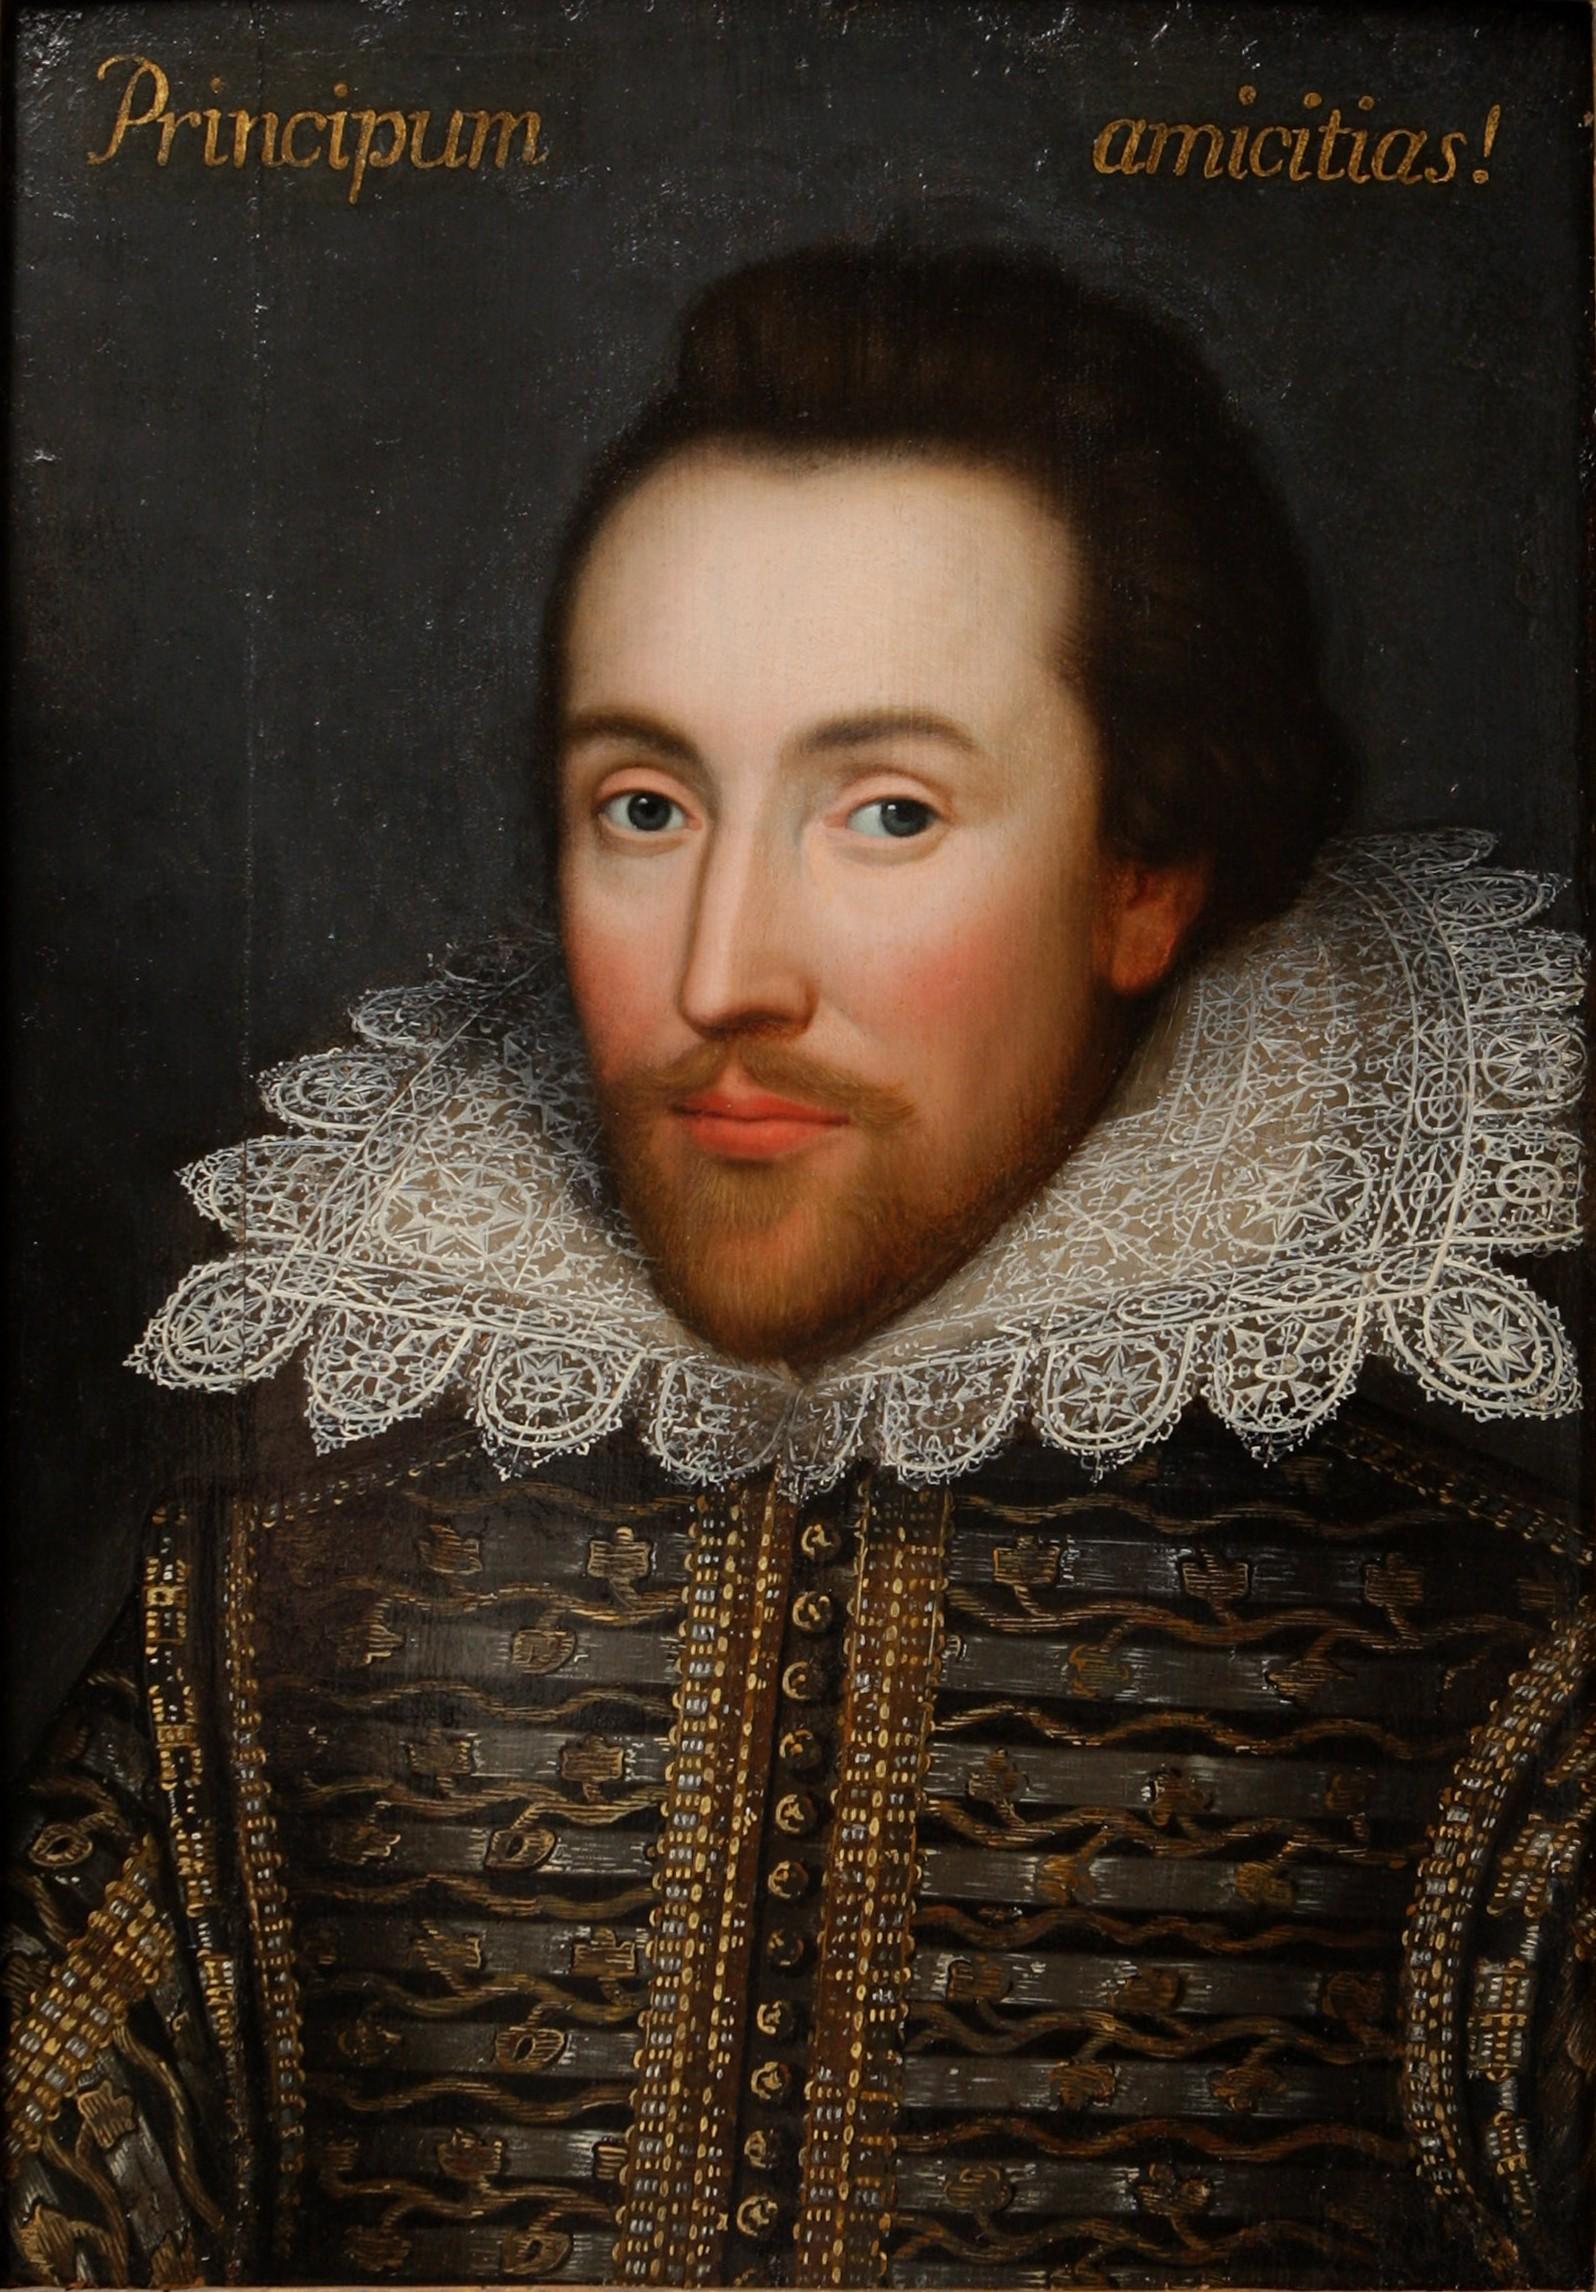 William Shakespeare (Foto: Hatchlands Park, via Wikimedia Commons)